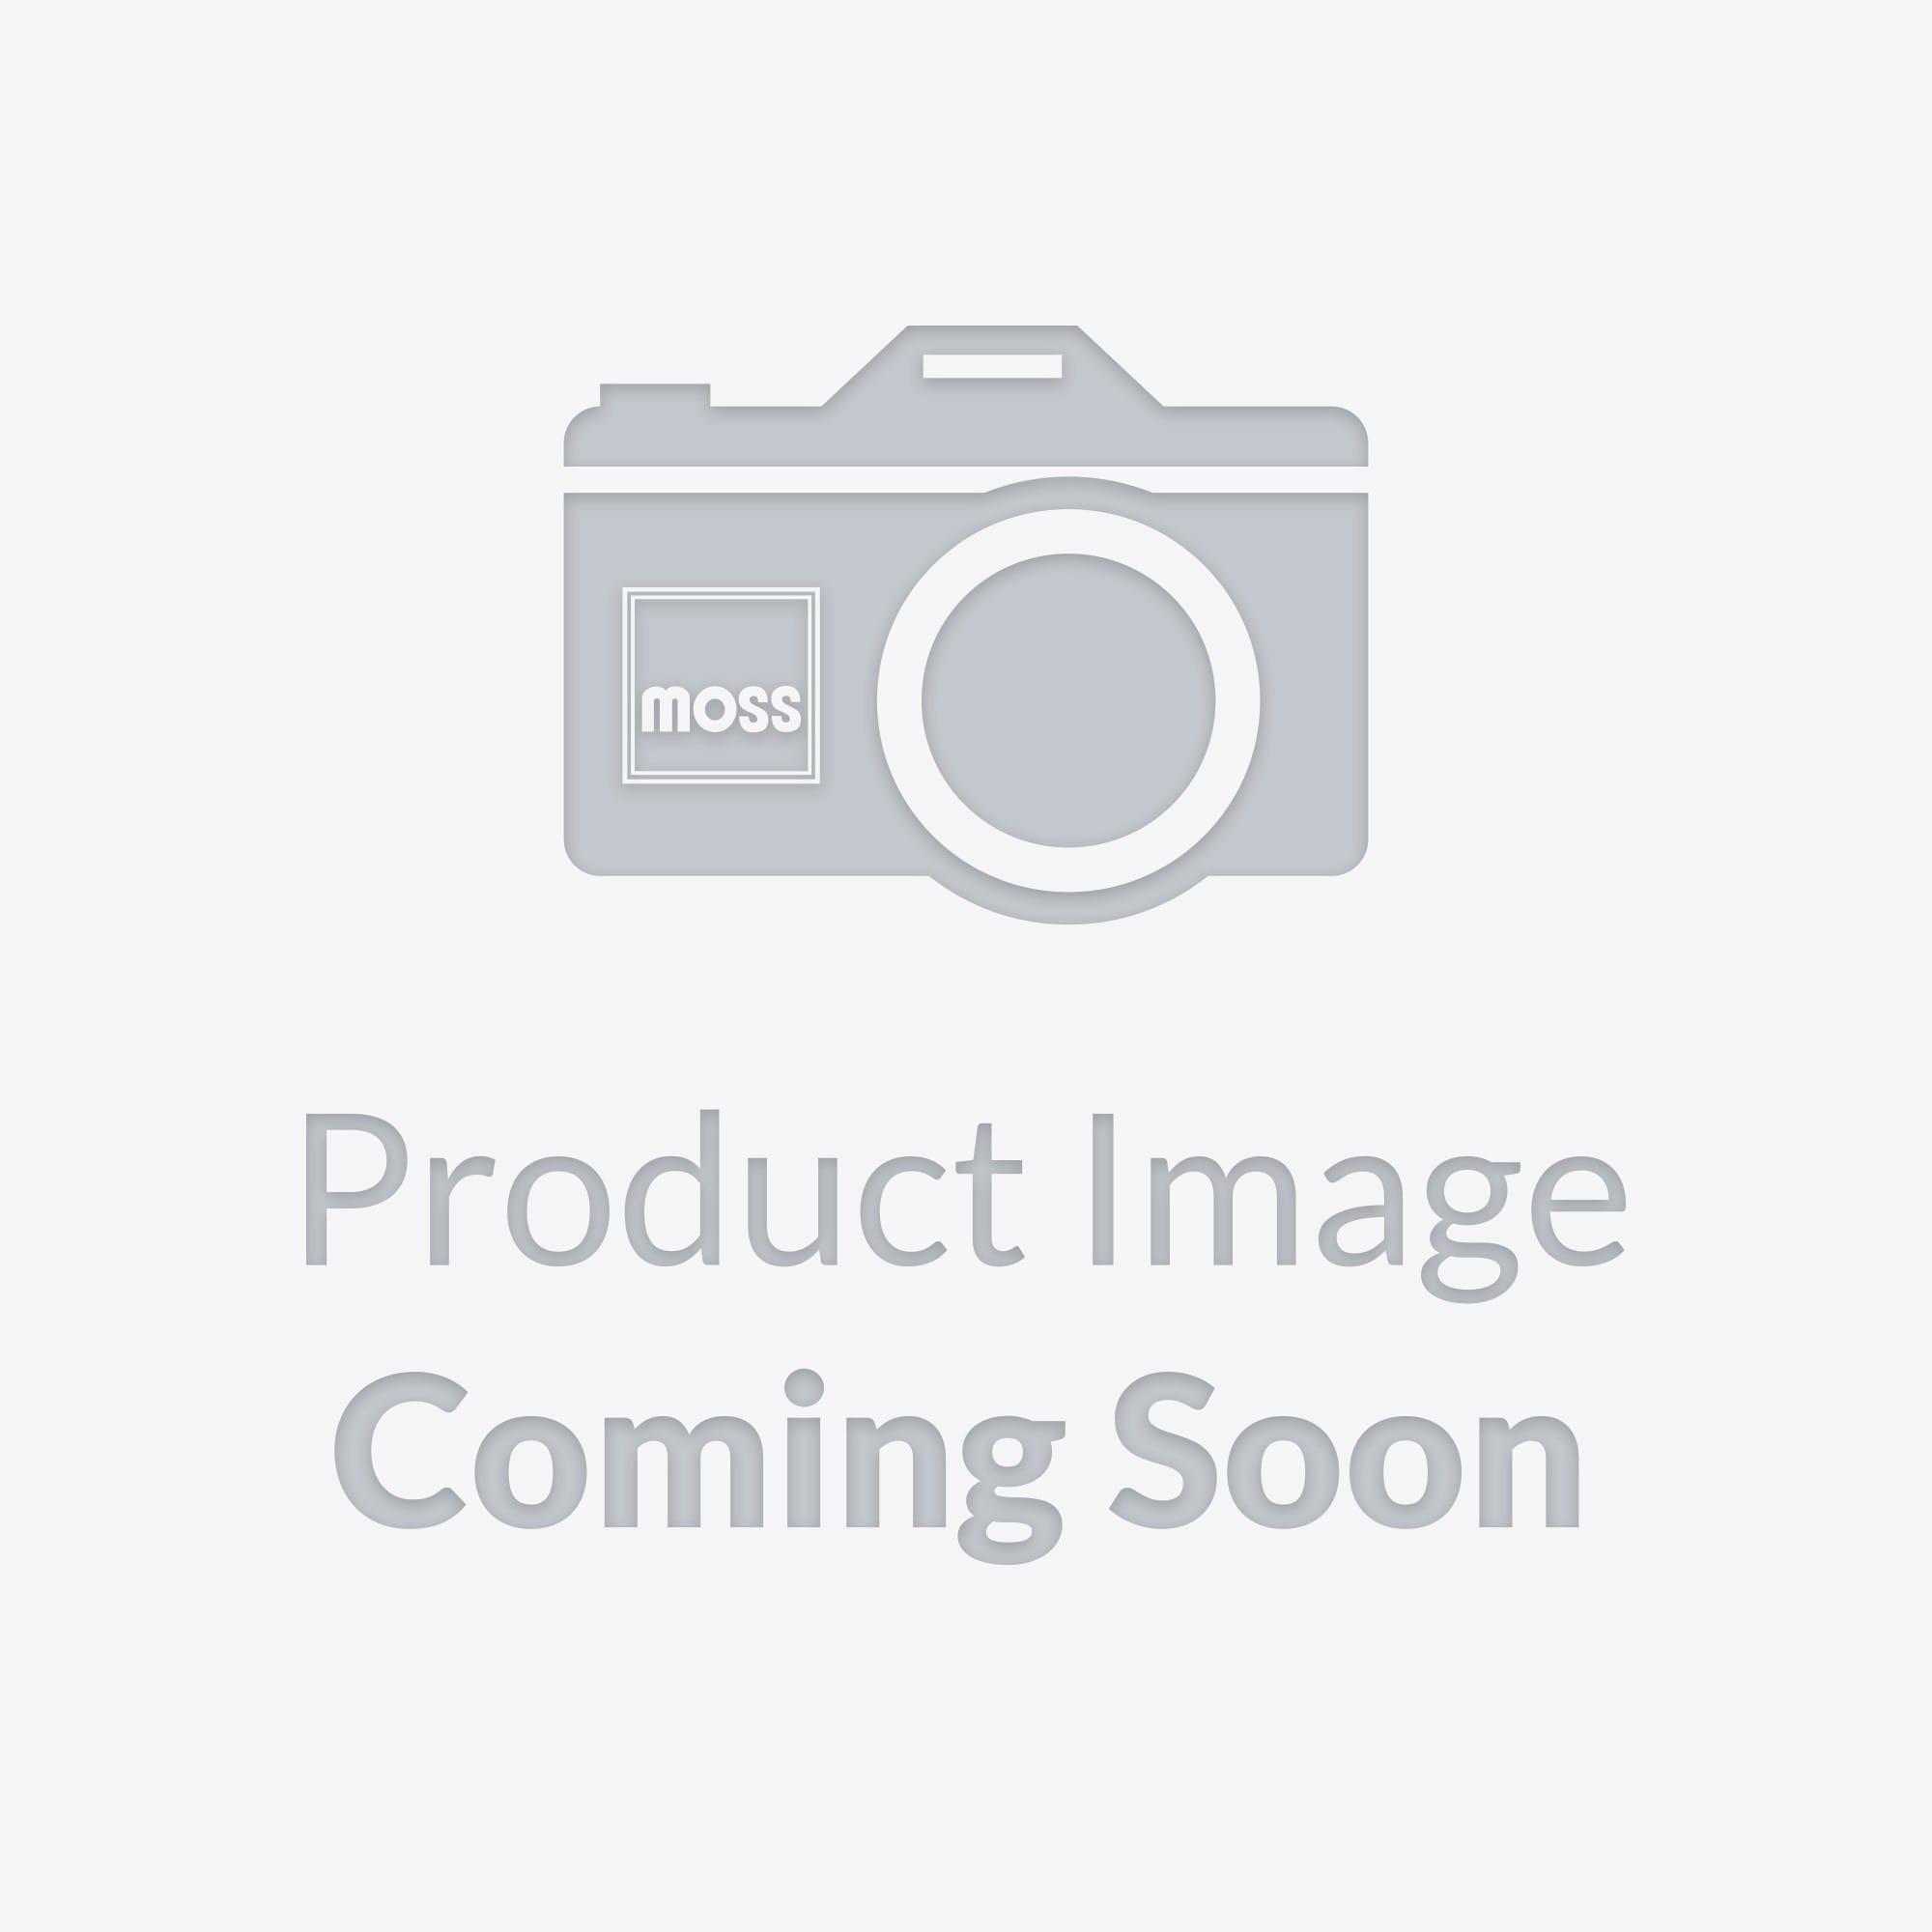 Healey Sprite Wiring Diagram Likewise 1976 Triumph Tr7 Wiring Diagrams